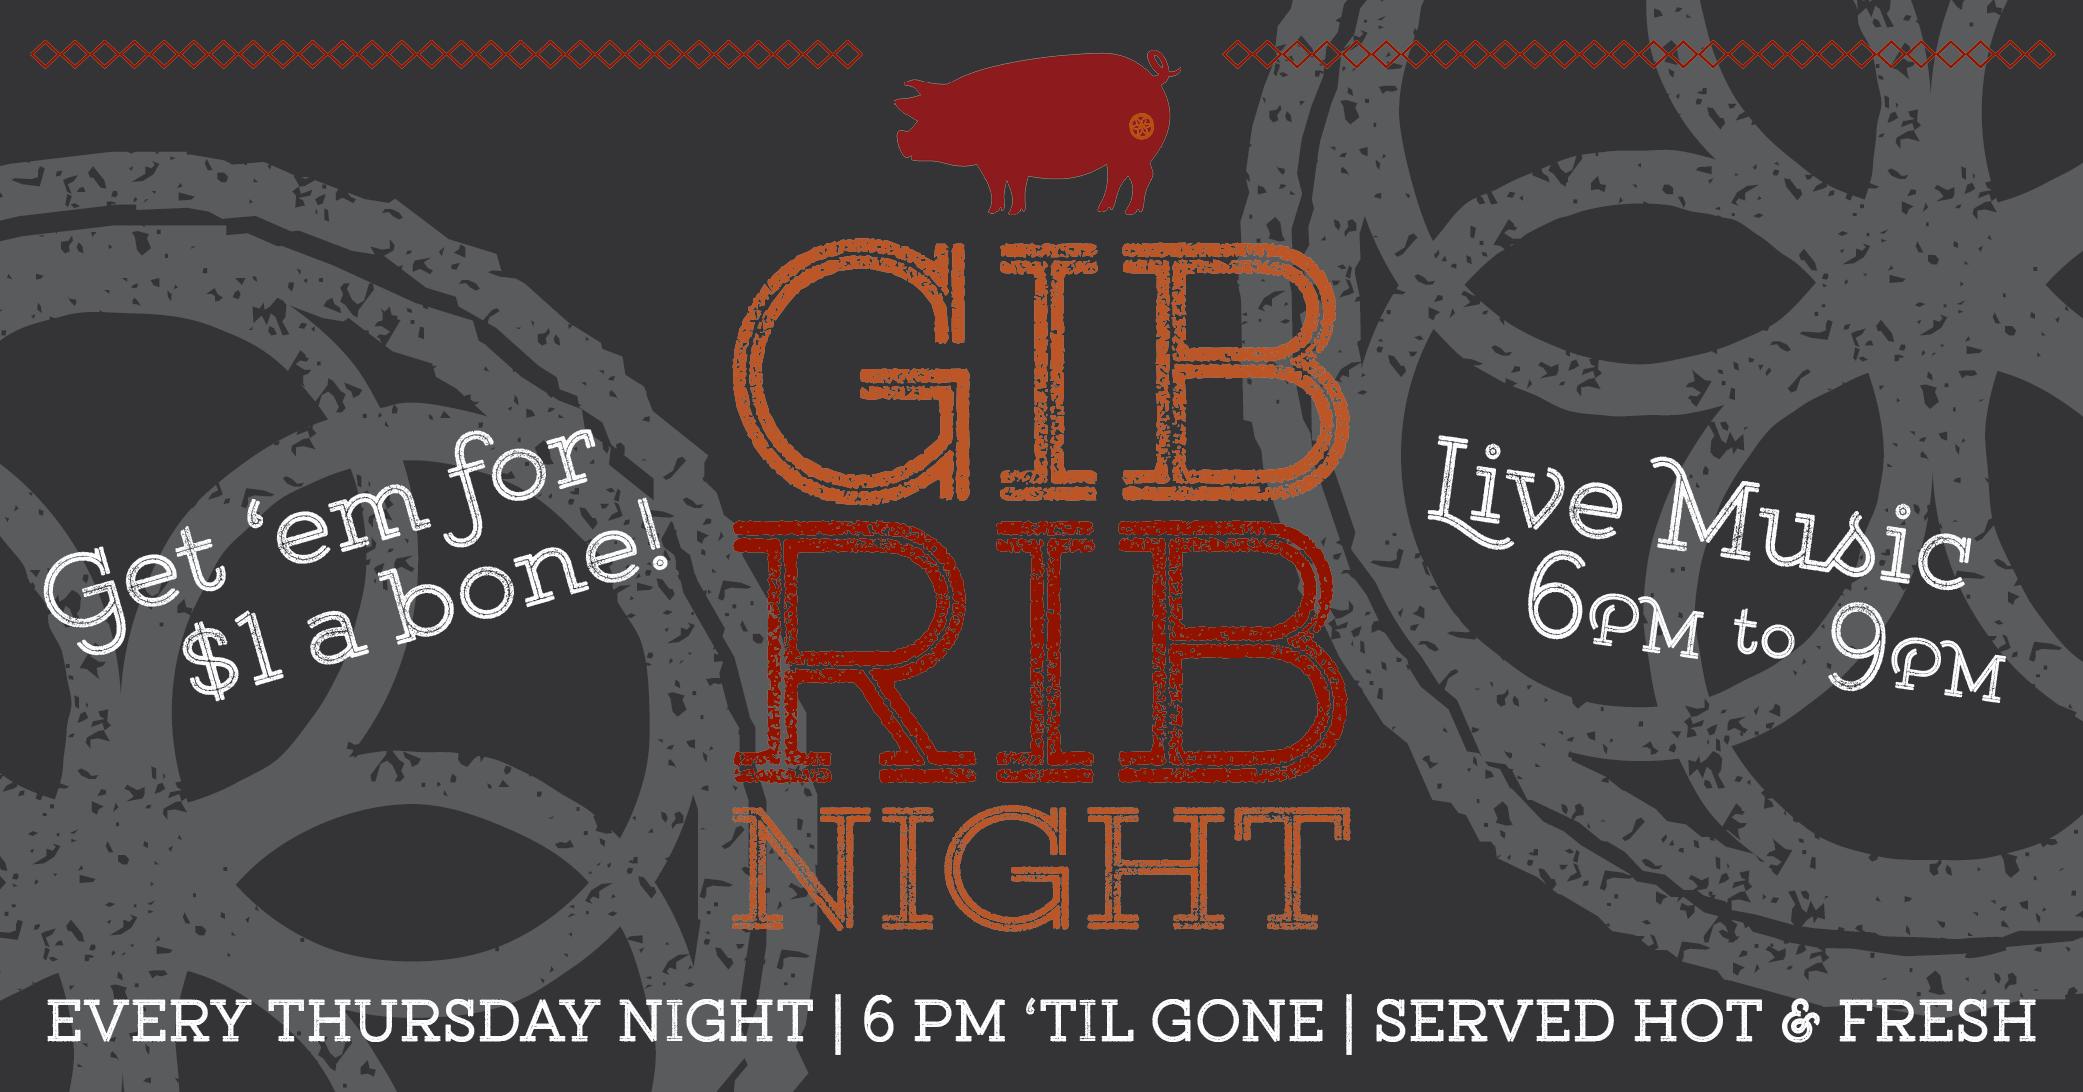 GIB Rib Night FB Event Cover Photo 2018.png